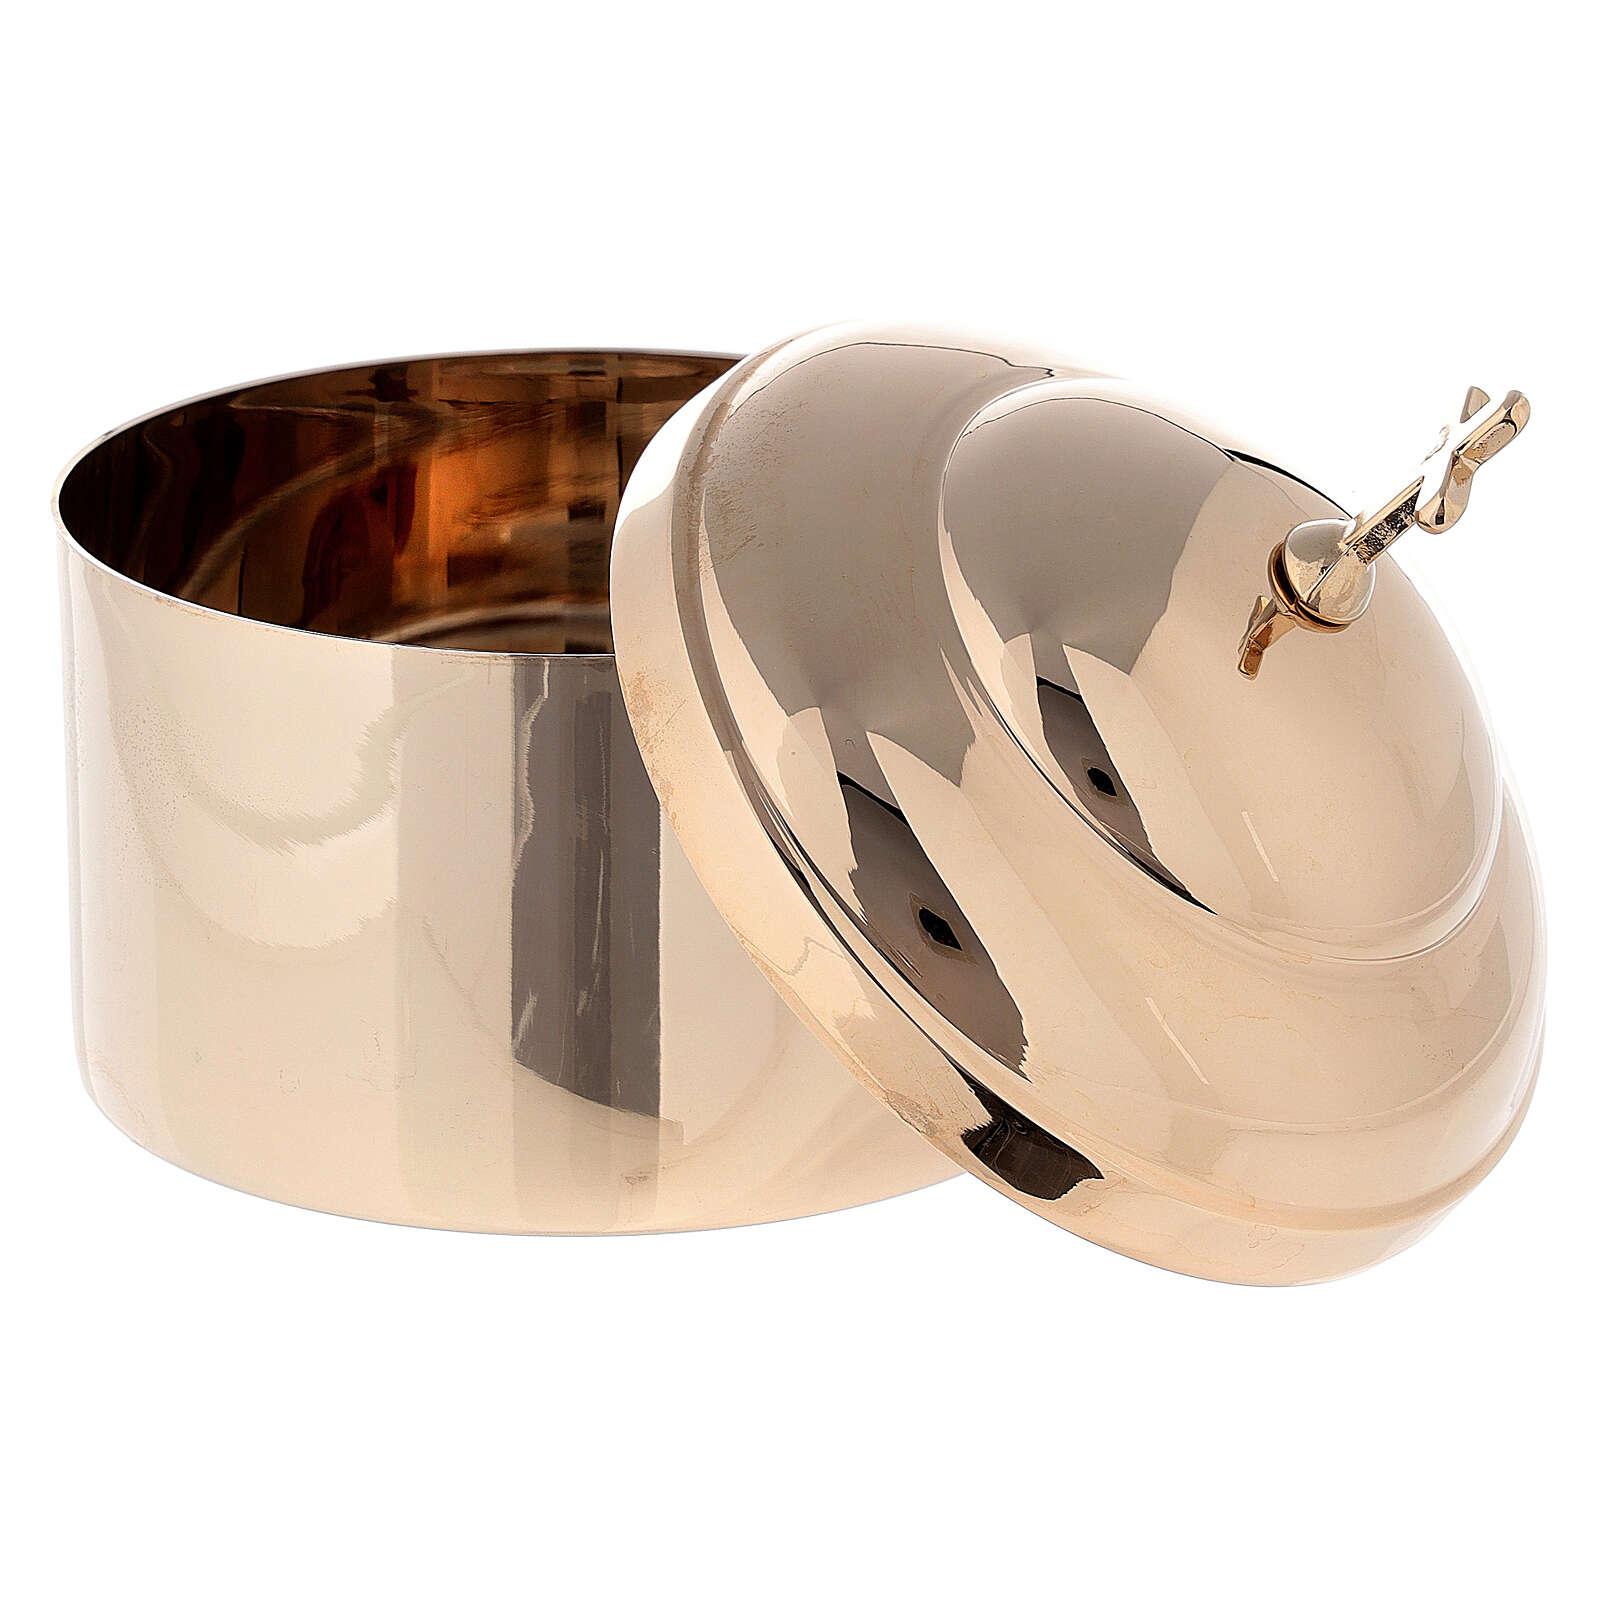 Hostbox in shiny golden brass 3